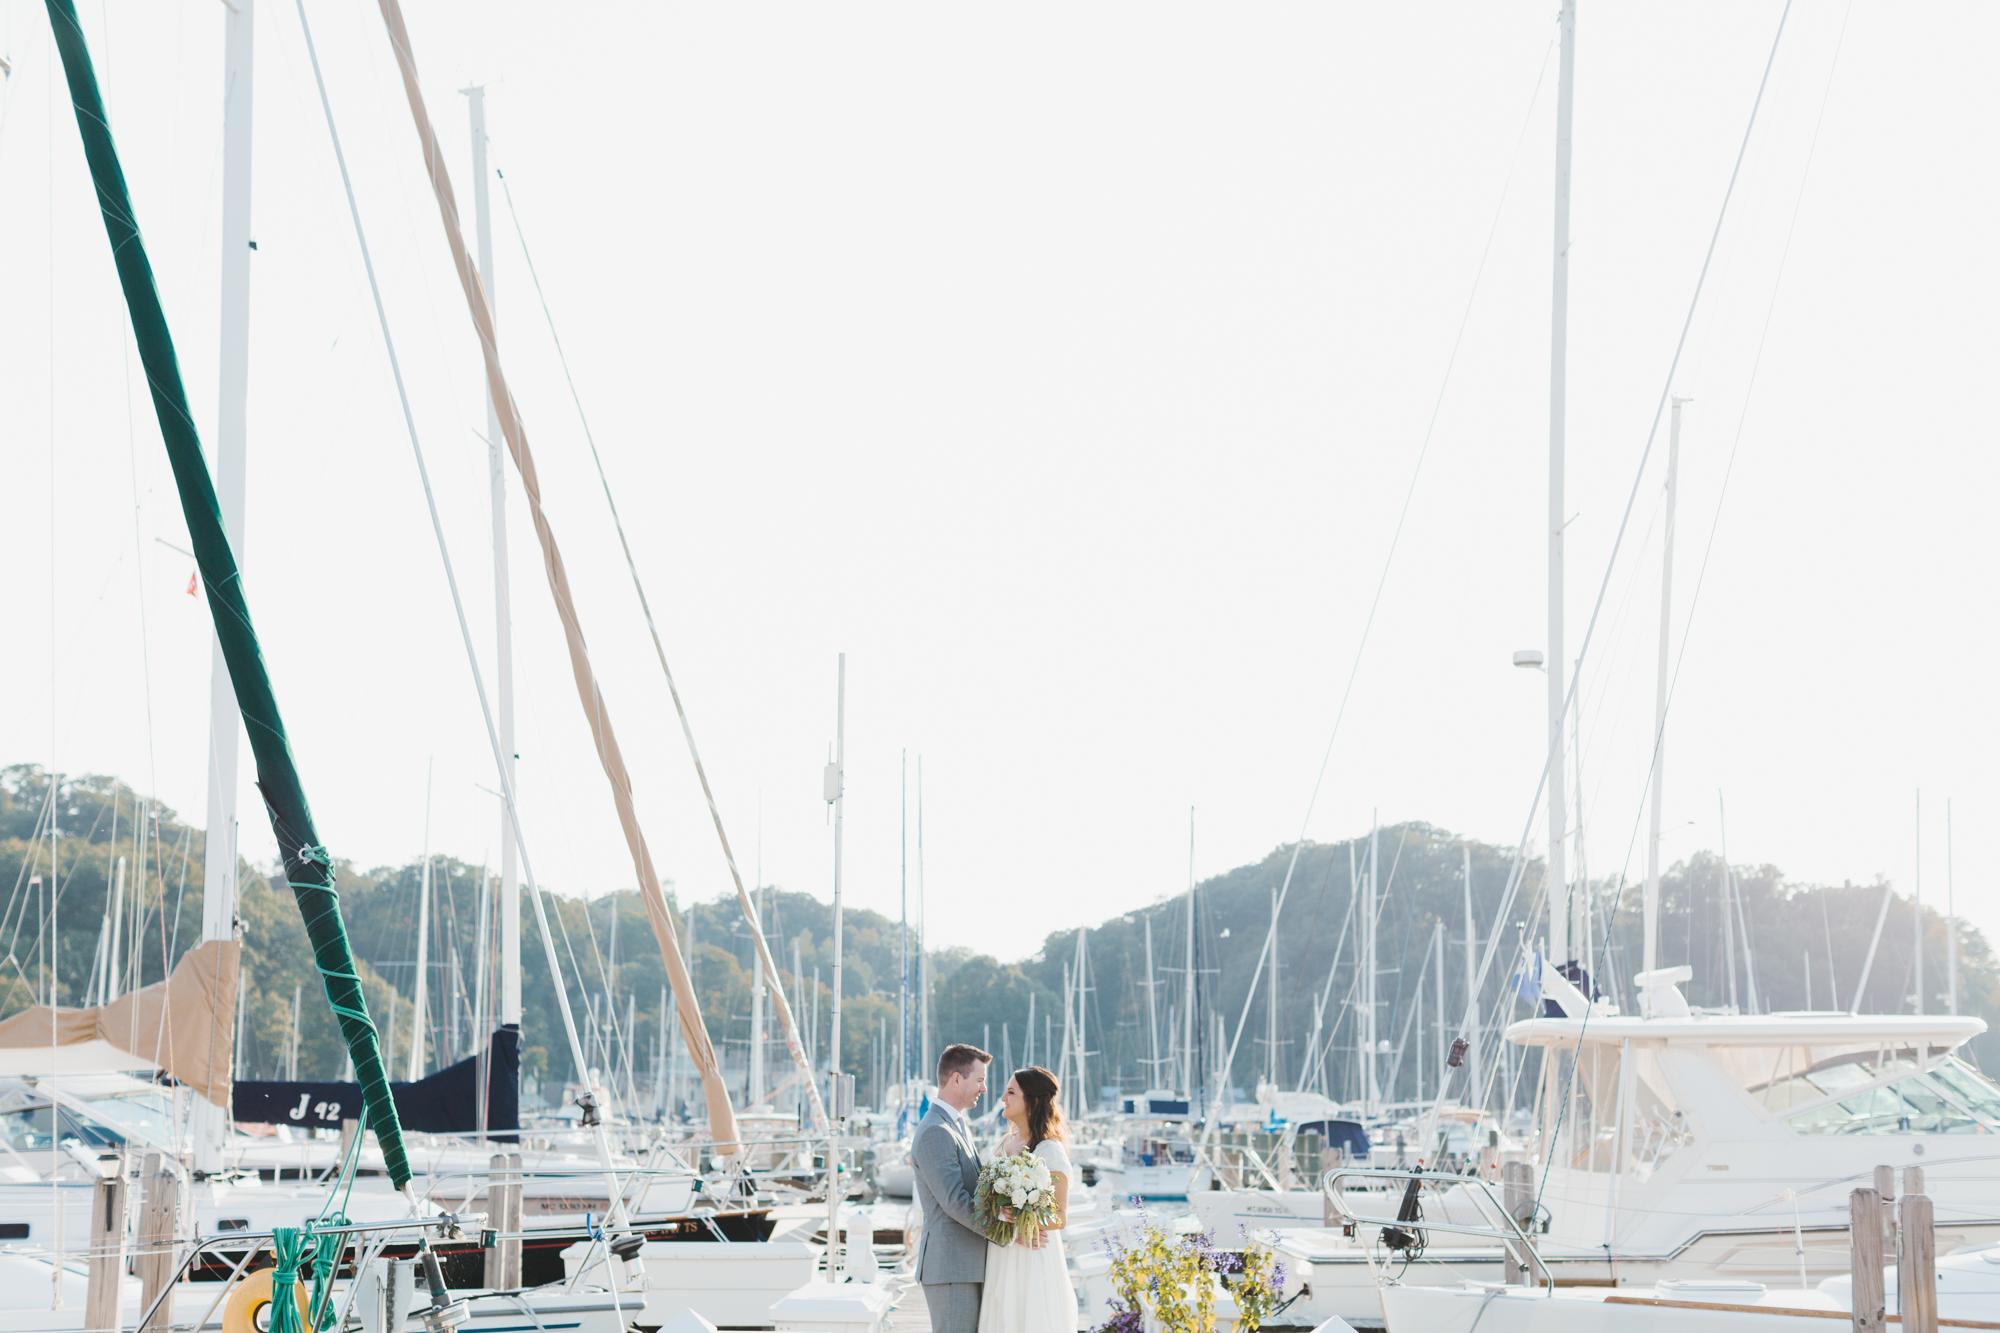 Holland Lake Michigan Wedding Photographer Mae Stier-056.jpg